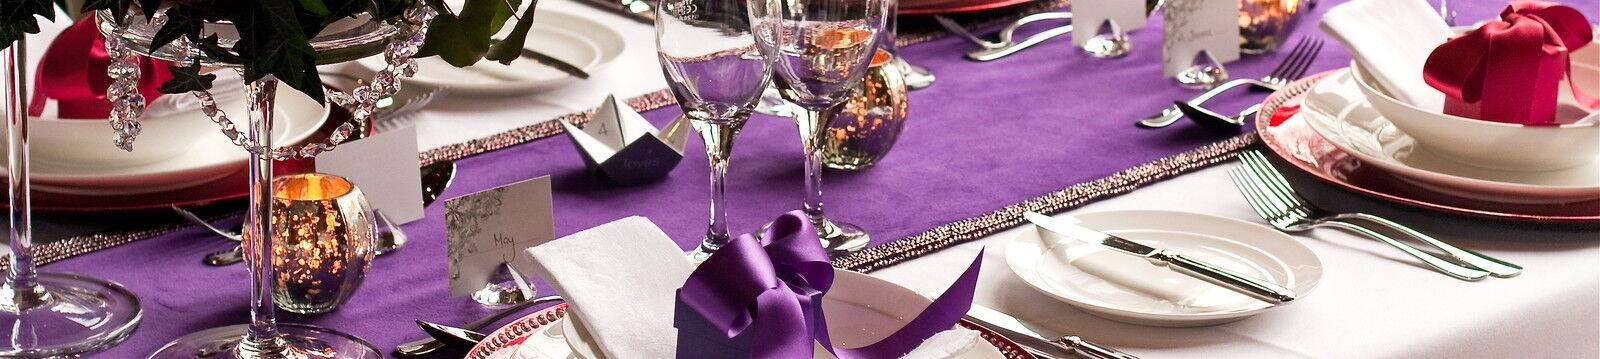 Silver Bee Wedding Decorations